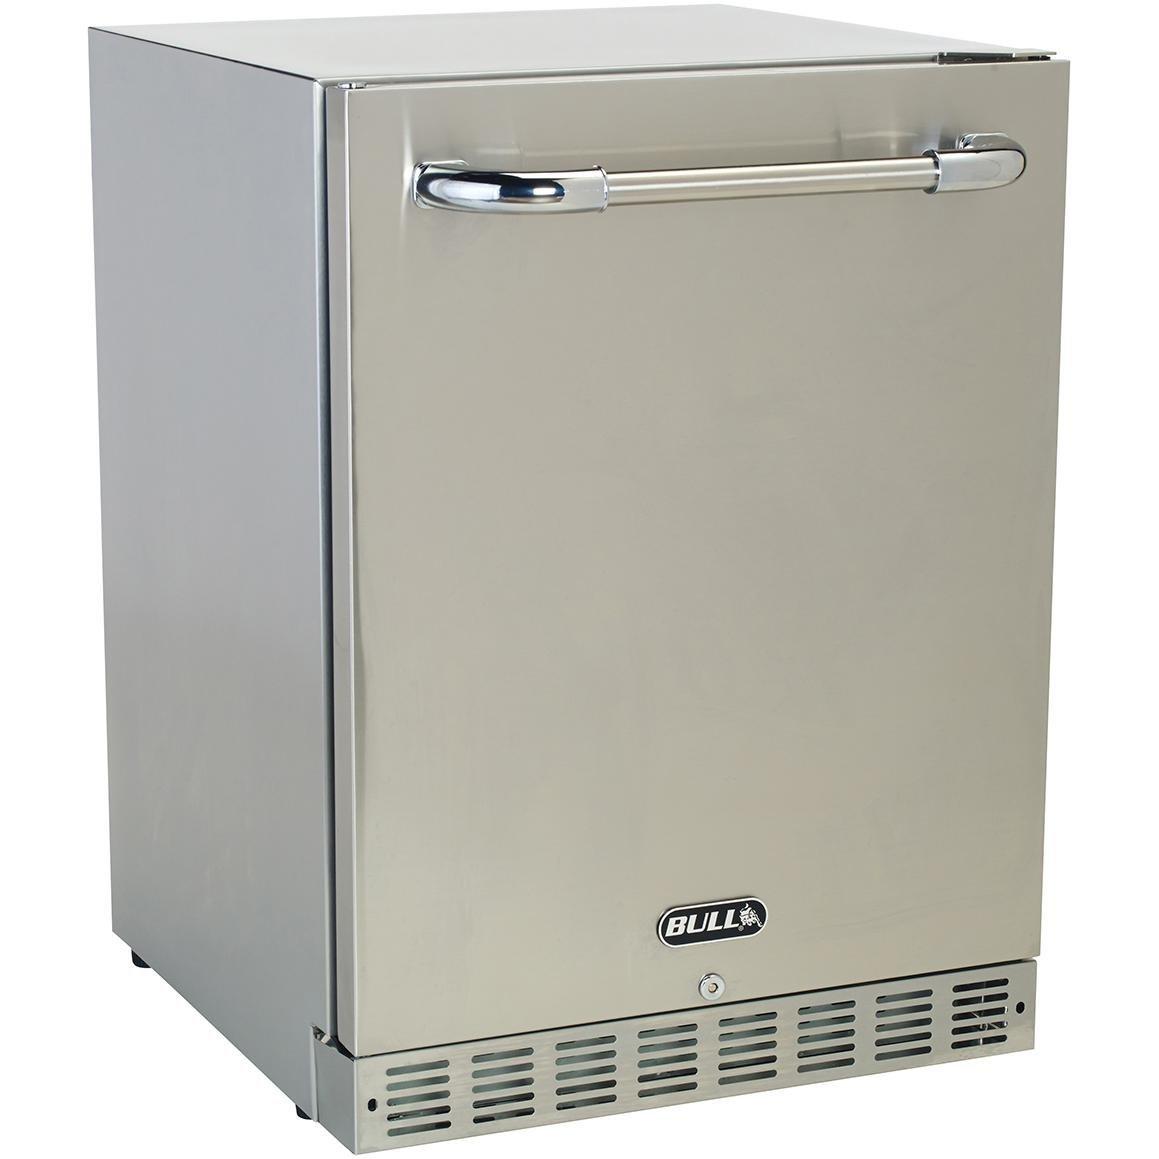 Refrigerator Outdoor Amazoncom Bull 24 Inch Compact Refrigerator 56 Cu Ft Built